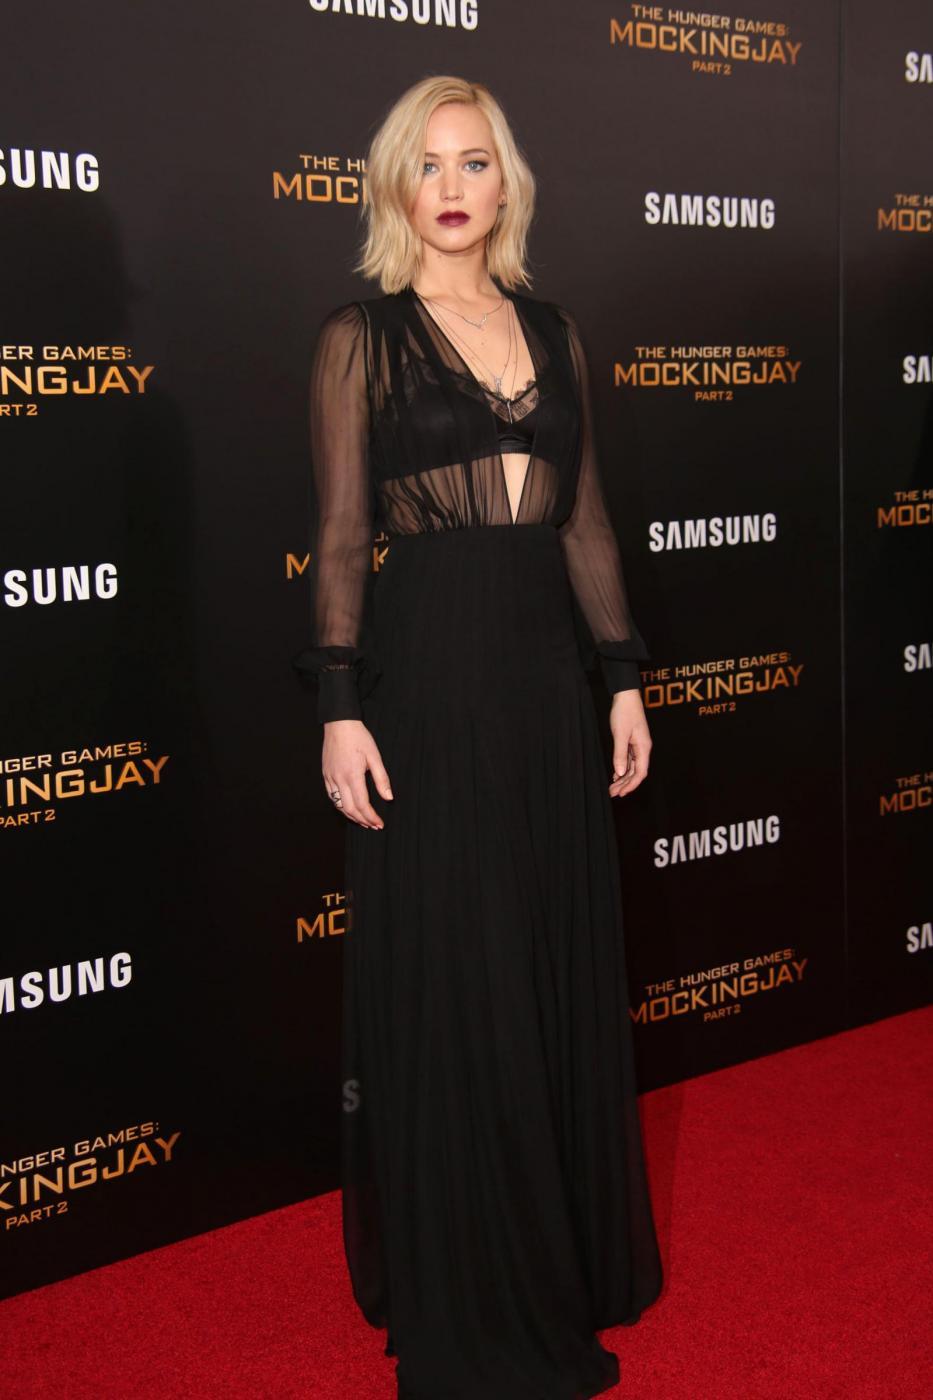 Jennifer Lawrence: reggiseno in bella vista a New York FOTO 5